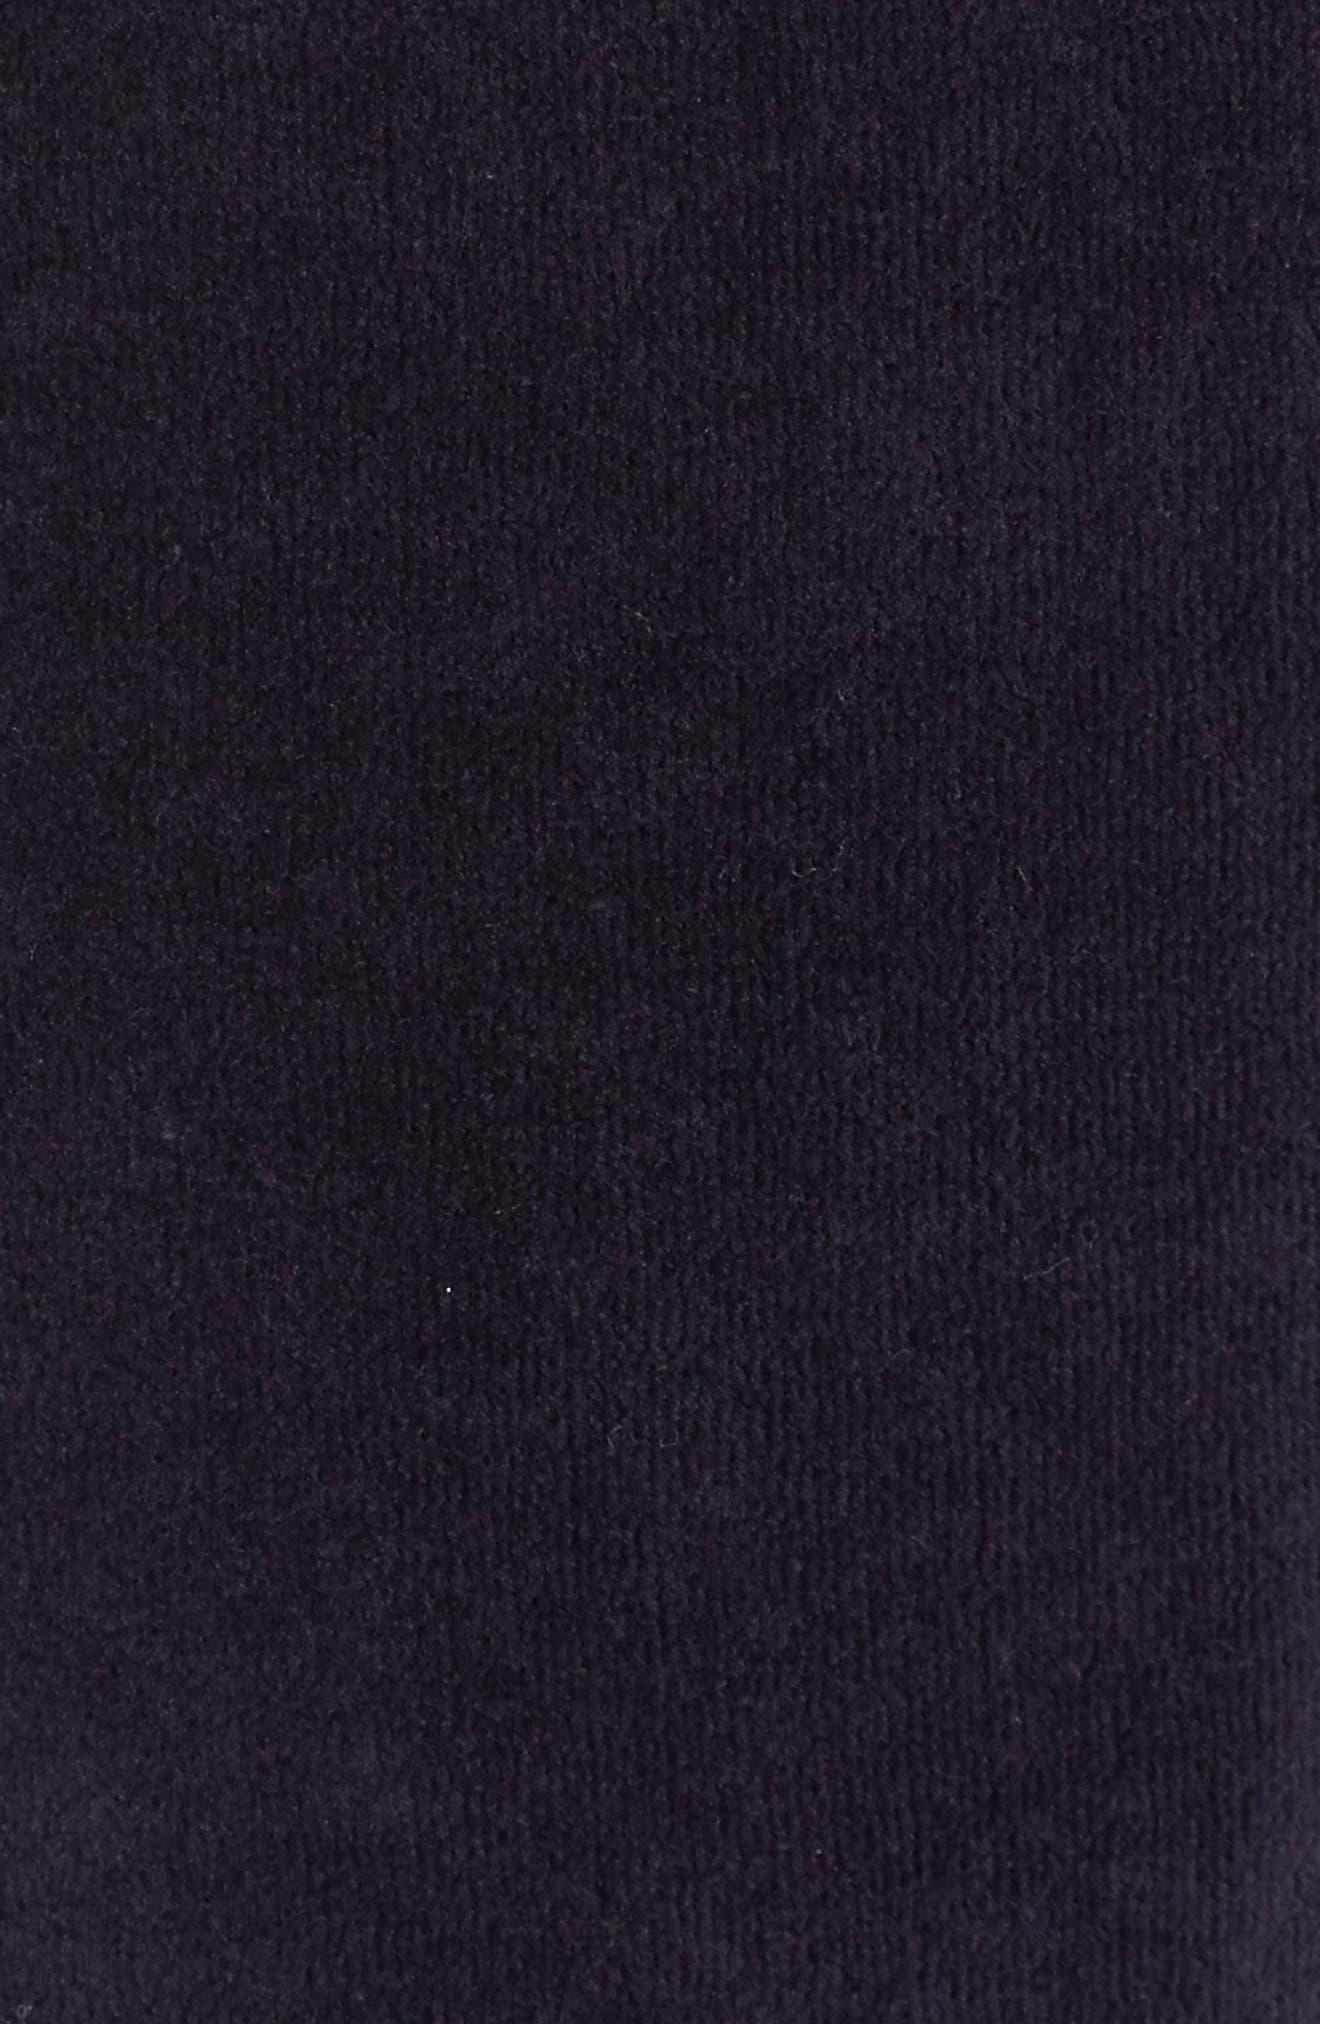 Velour Jogger Pants,                             Alternate thumbnail 5, color,